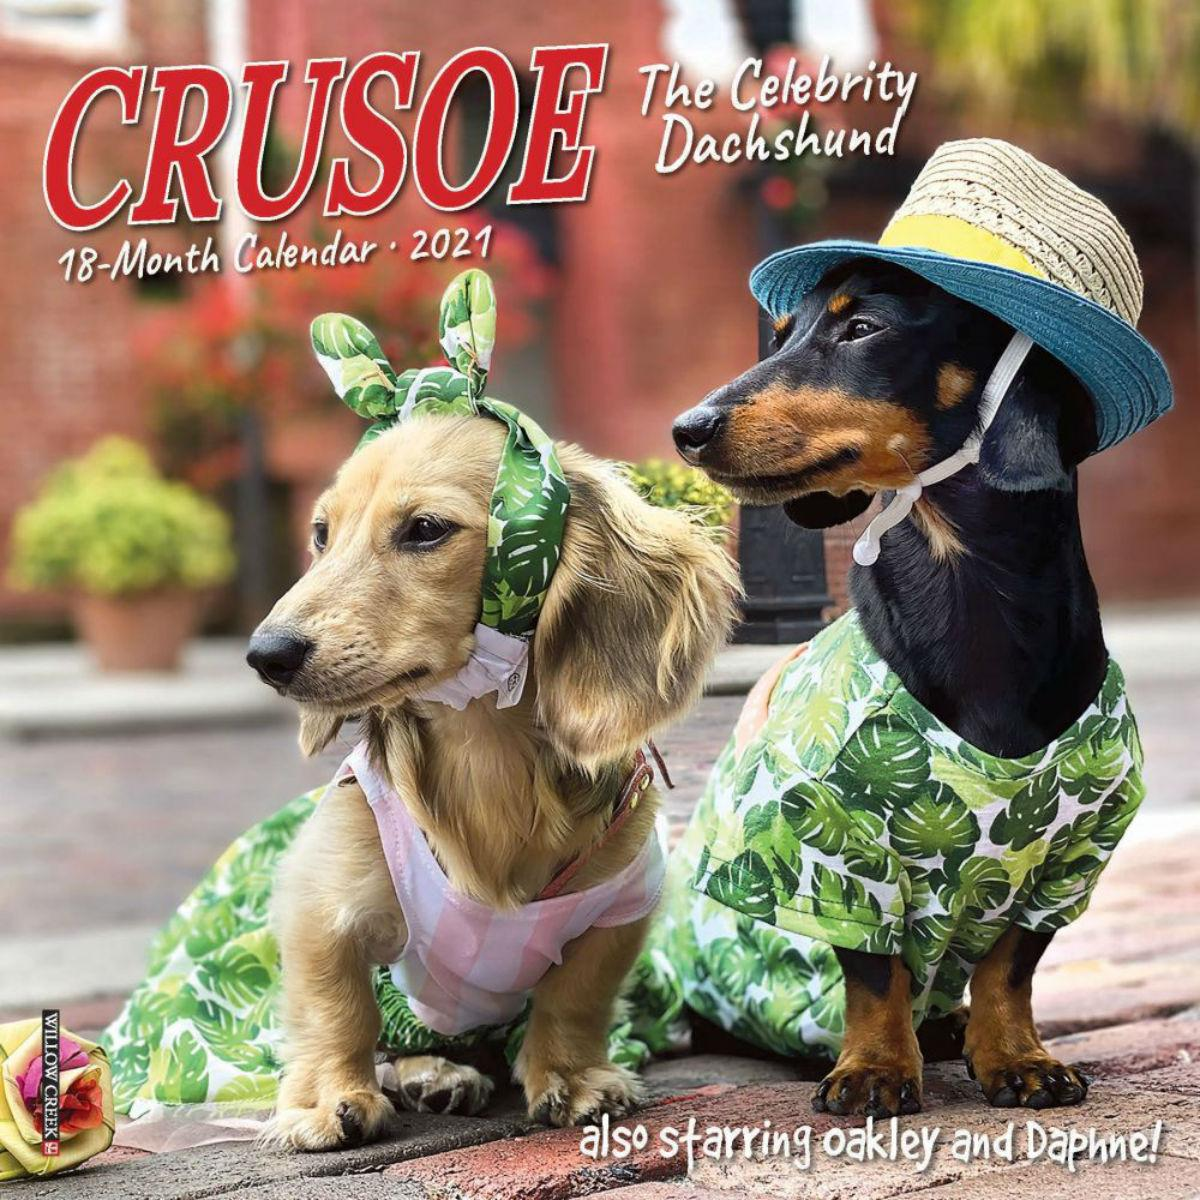 Crusoe the Celebrity Dachshund 2021 Mini Wall Calendar